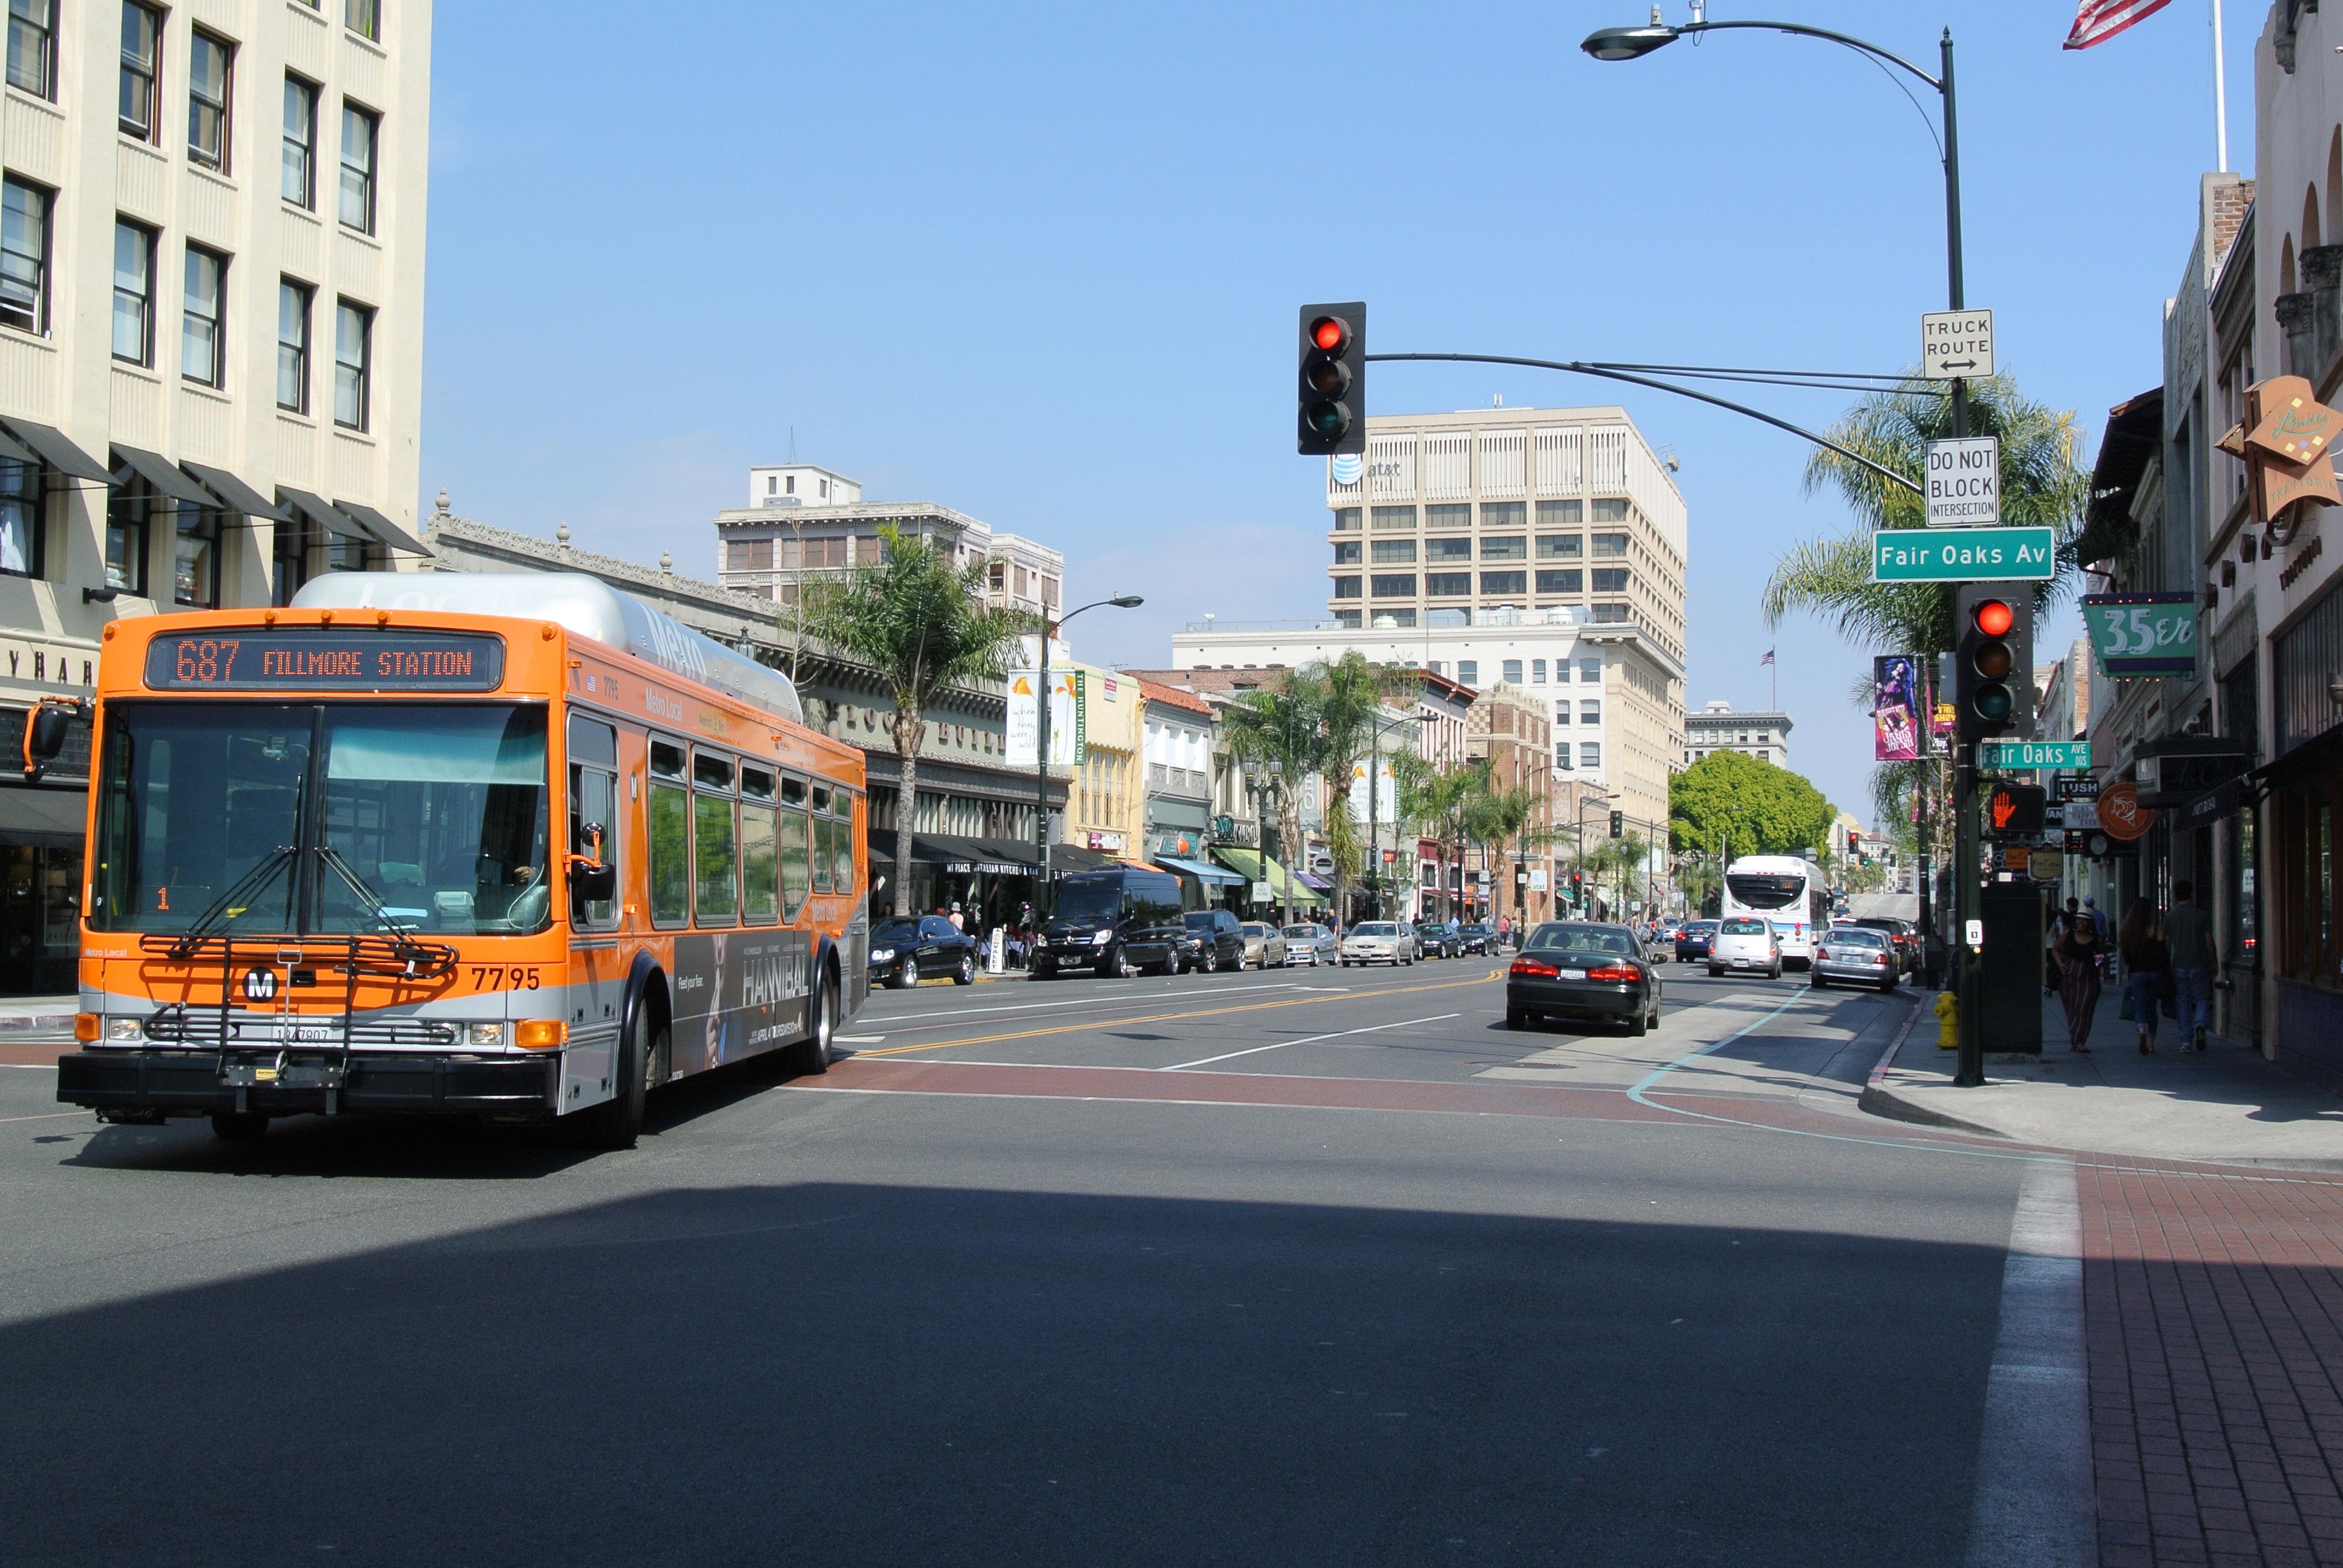 Downtown East Car Park Rates